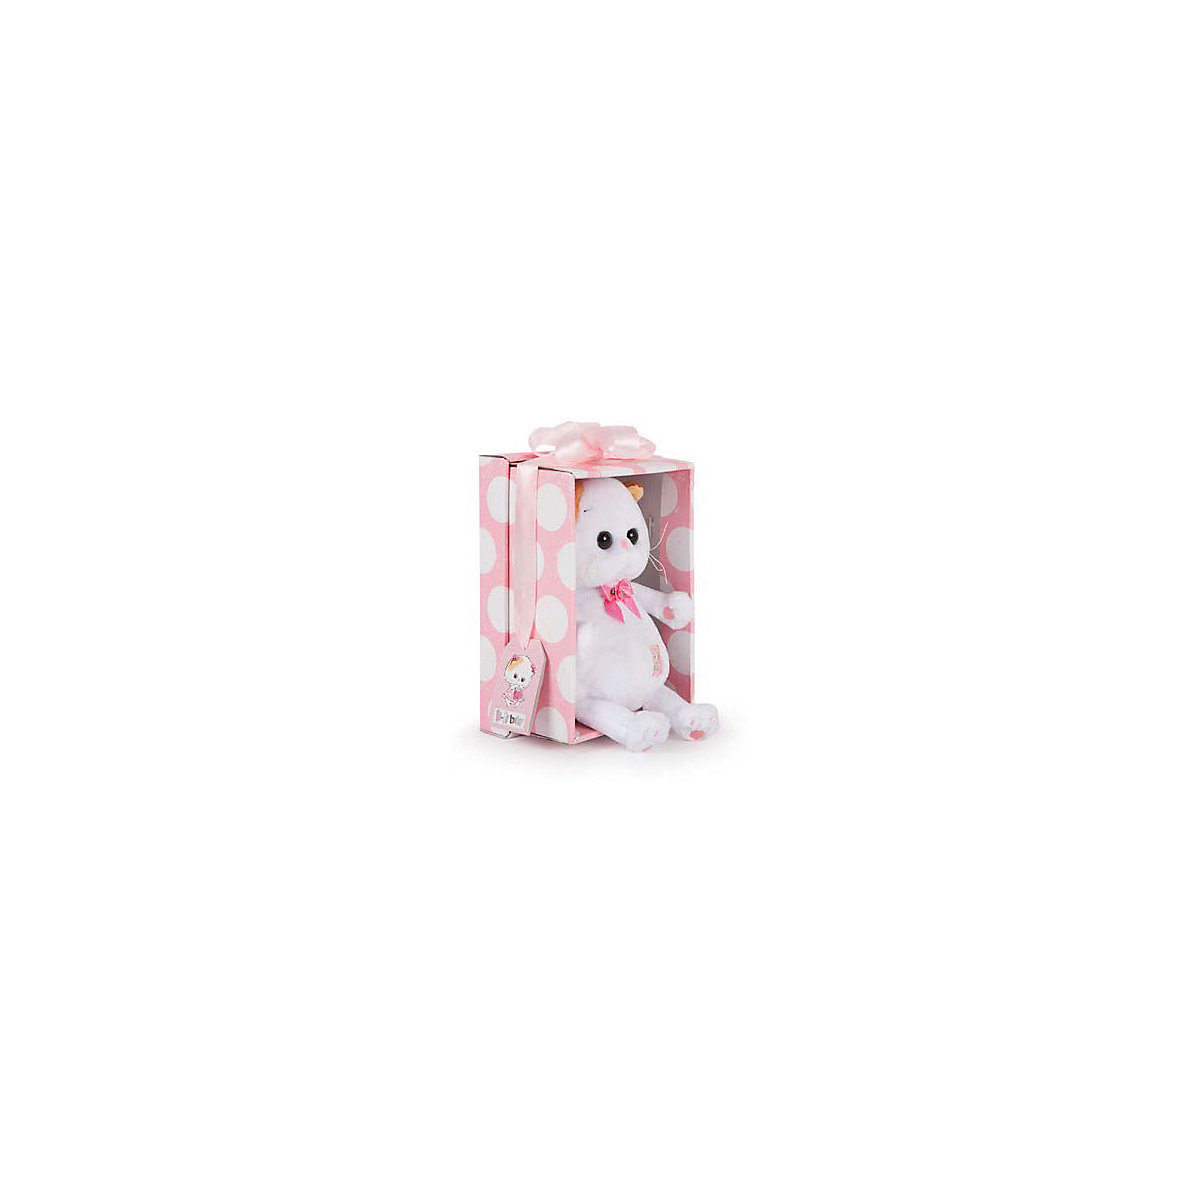 Gevulde & Pluche Dieren BUDI BASA 8999611 Stitch Beer Totoro Giraffe Fox Kat Hond Zachte Kinderen \'s speelgoed MTpromo - 5